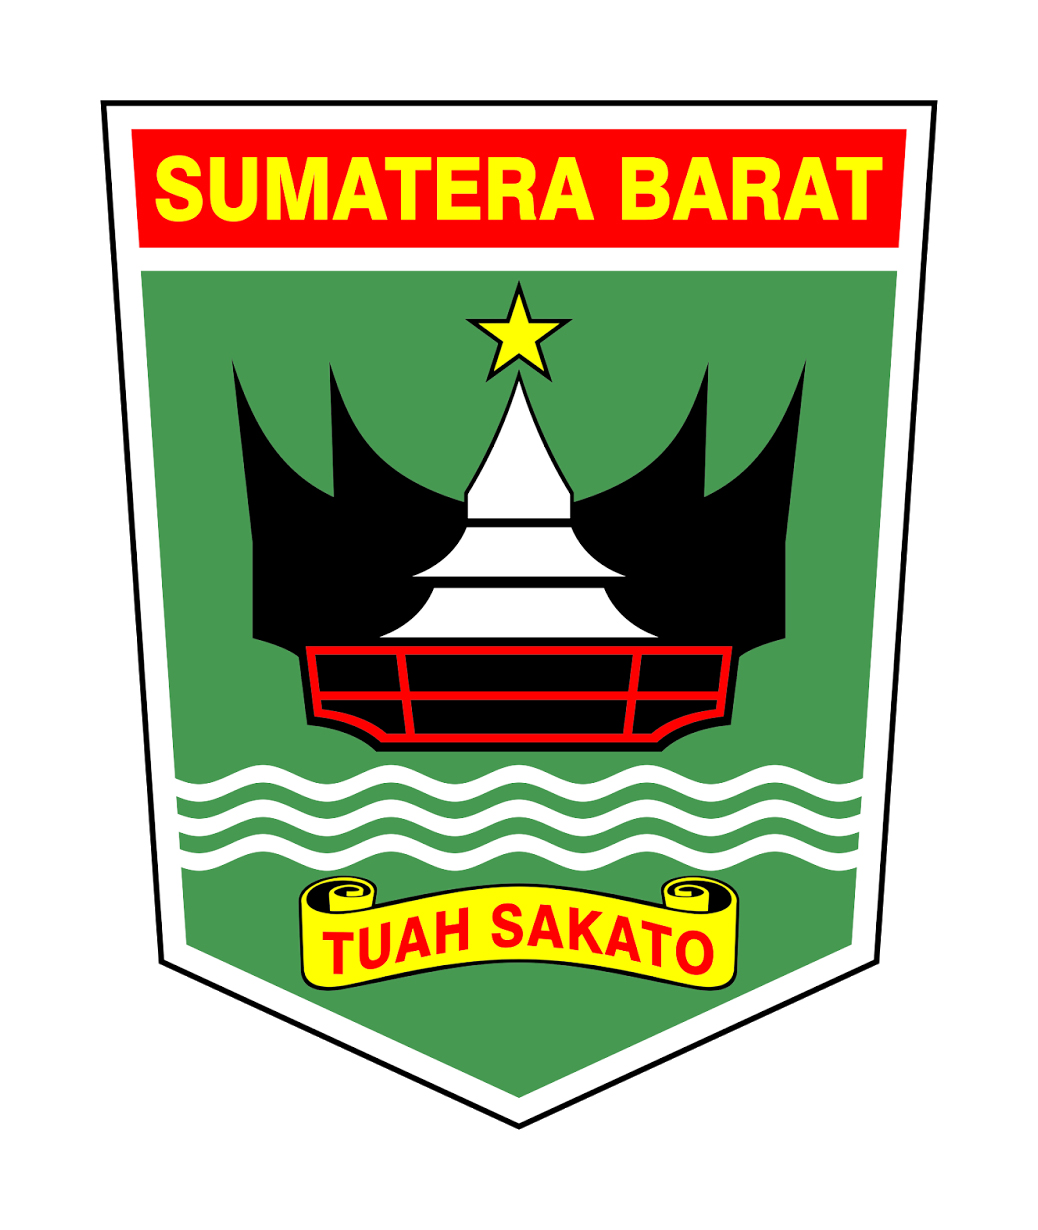 Logo Sumatera Barat (Provinsi Sumatera Barat)